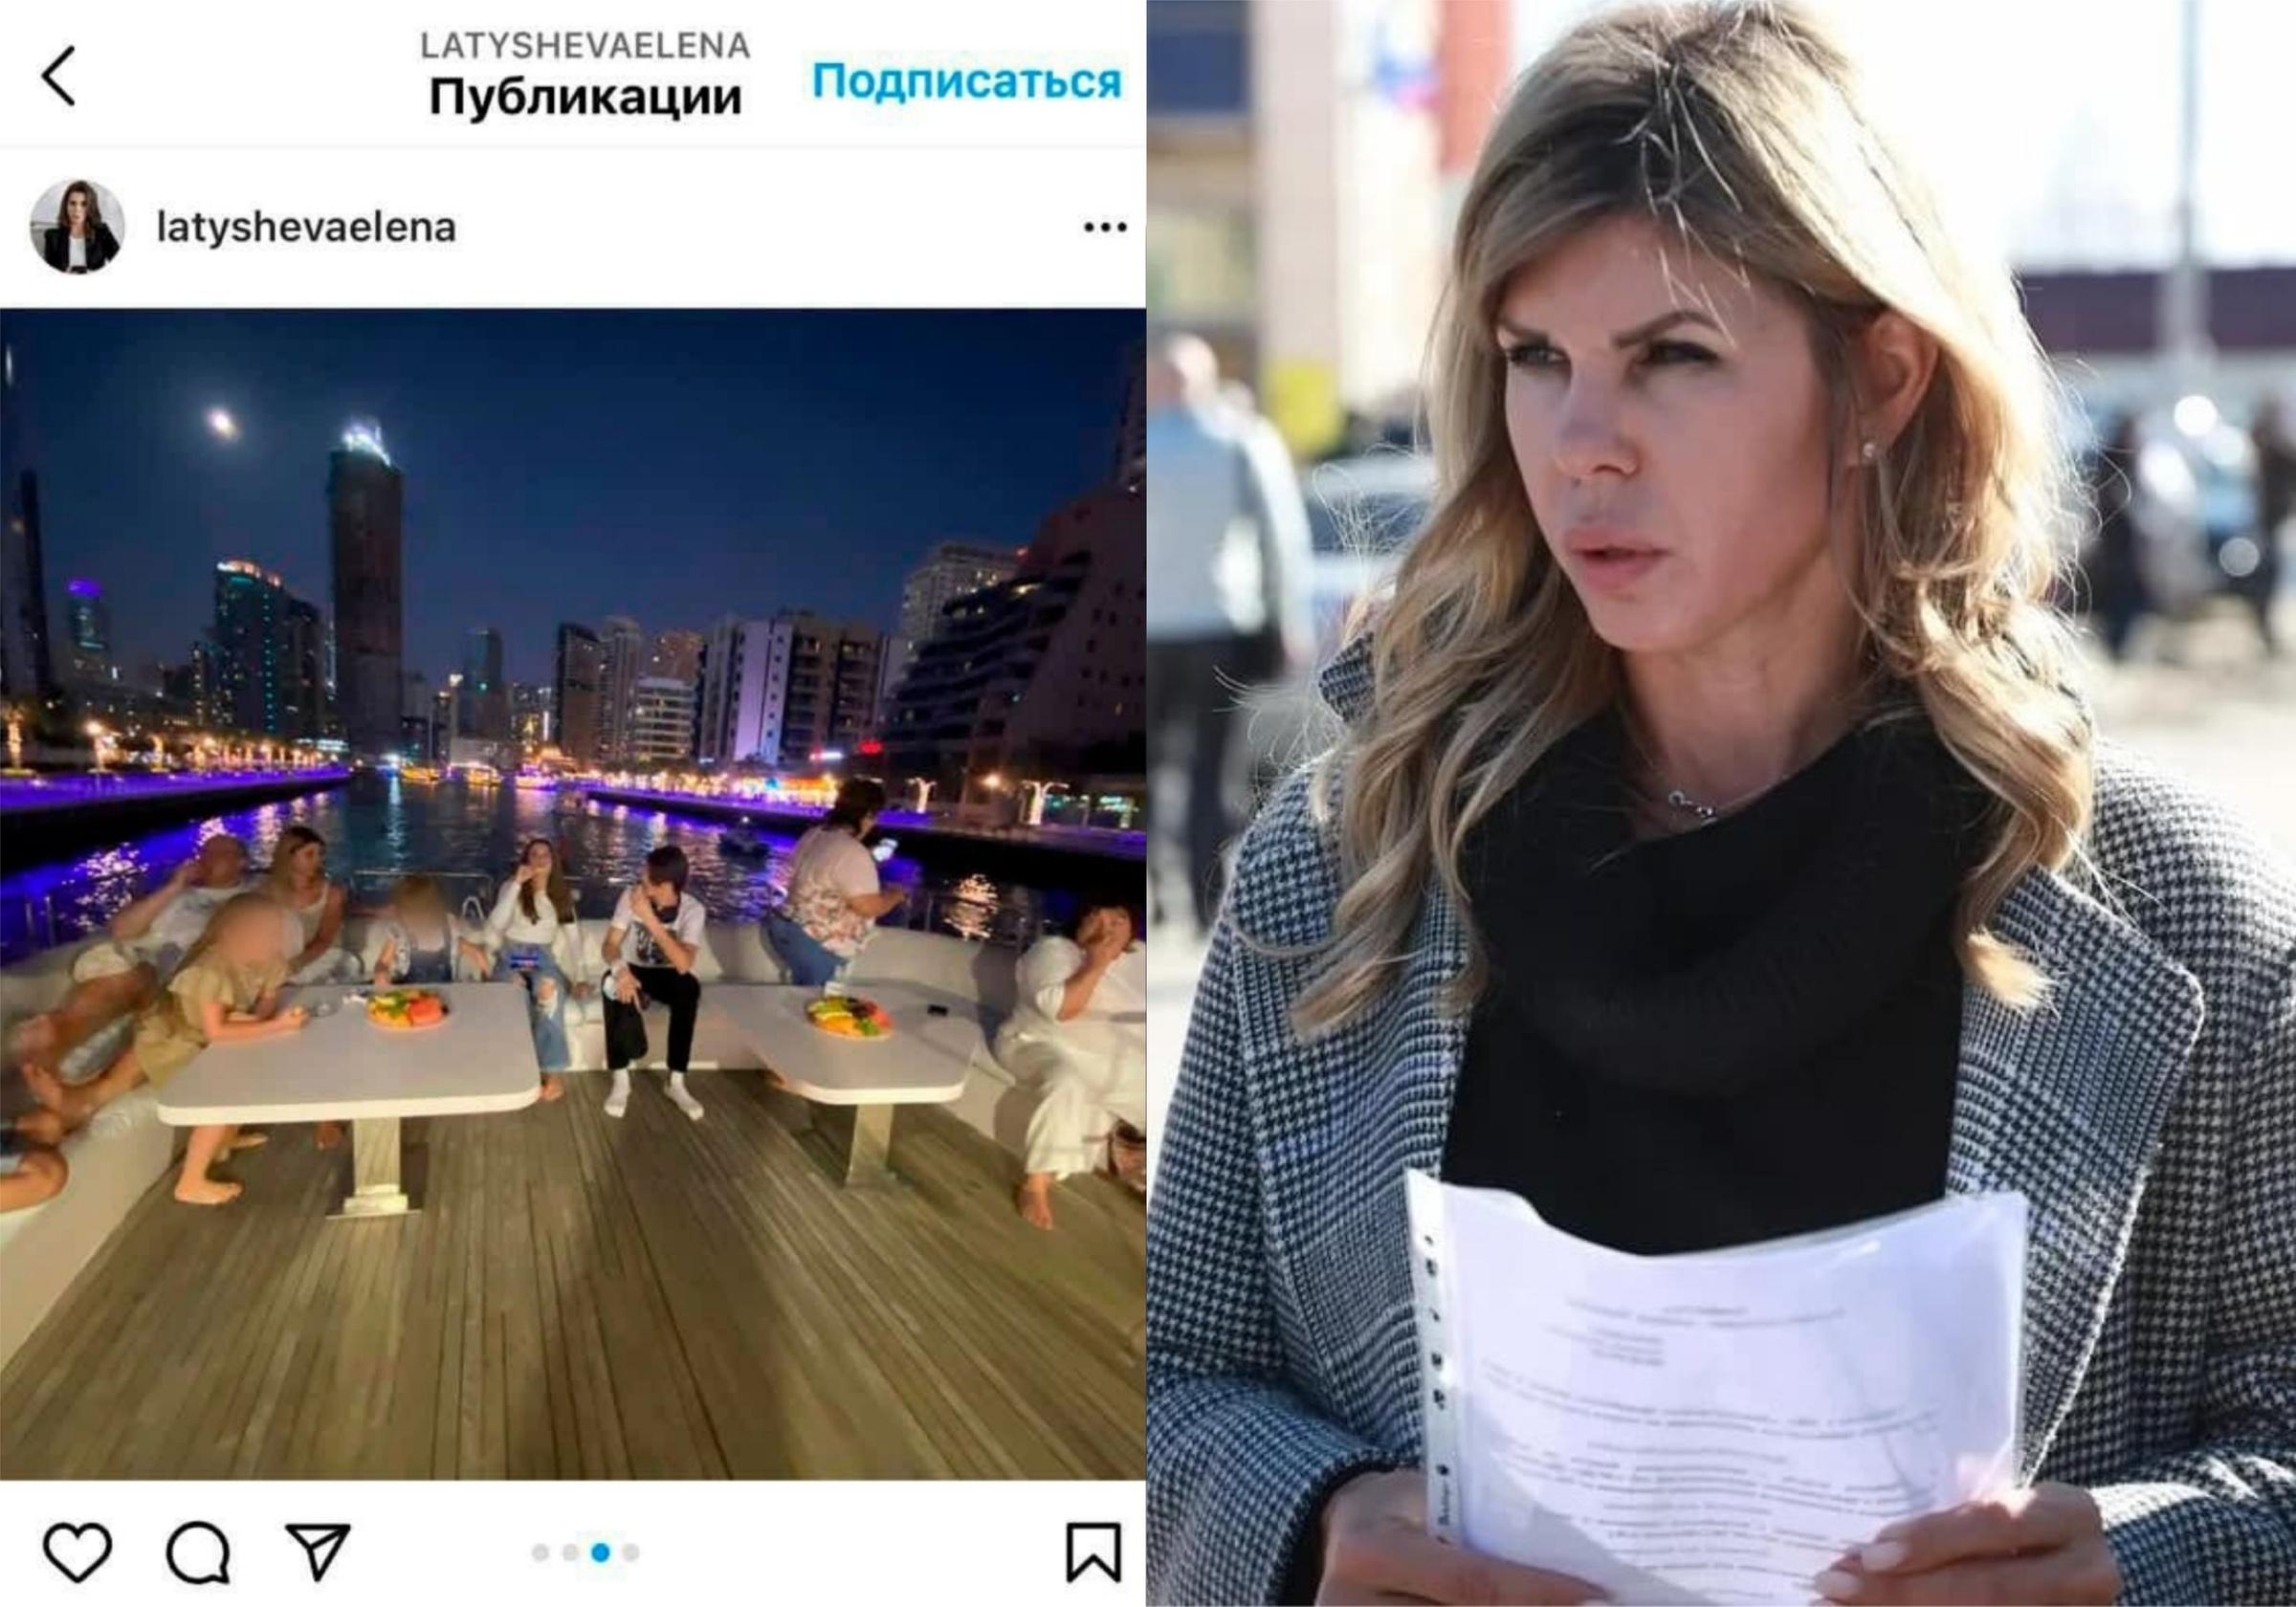 Фото © Telegram / Хомутинников и Instagram / uvarkina_evgenia